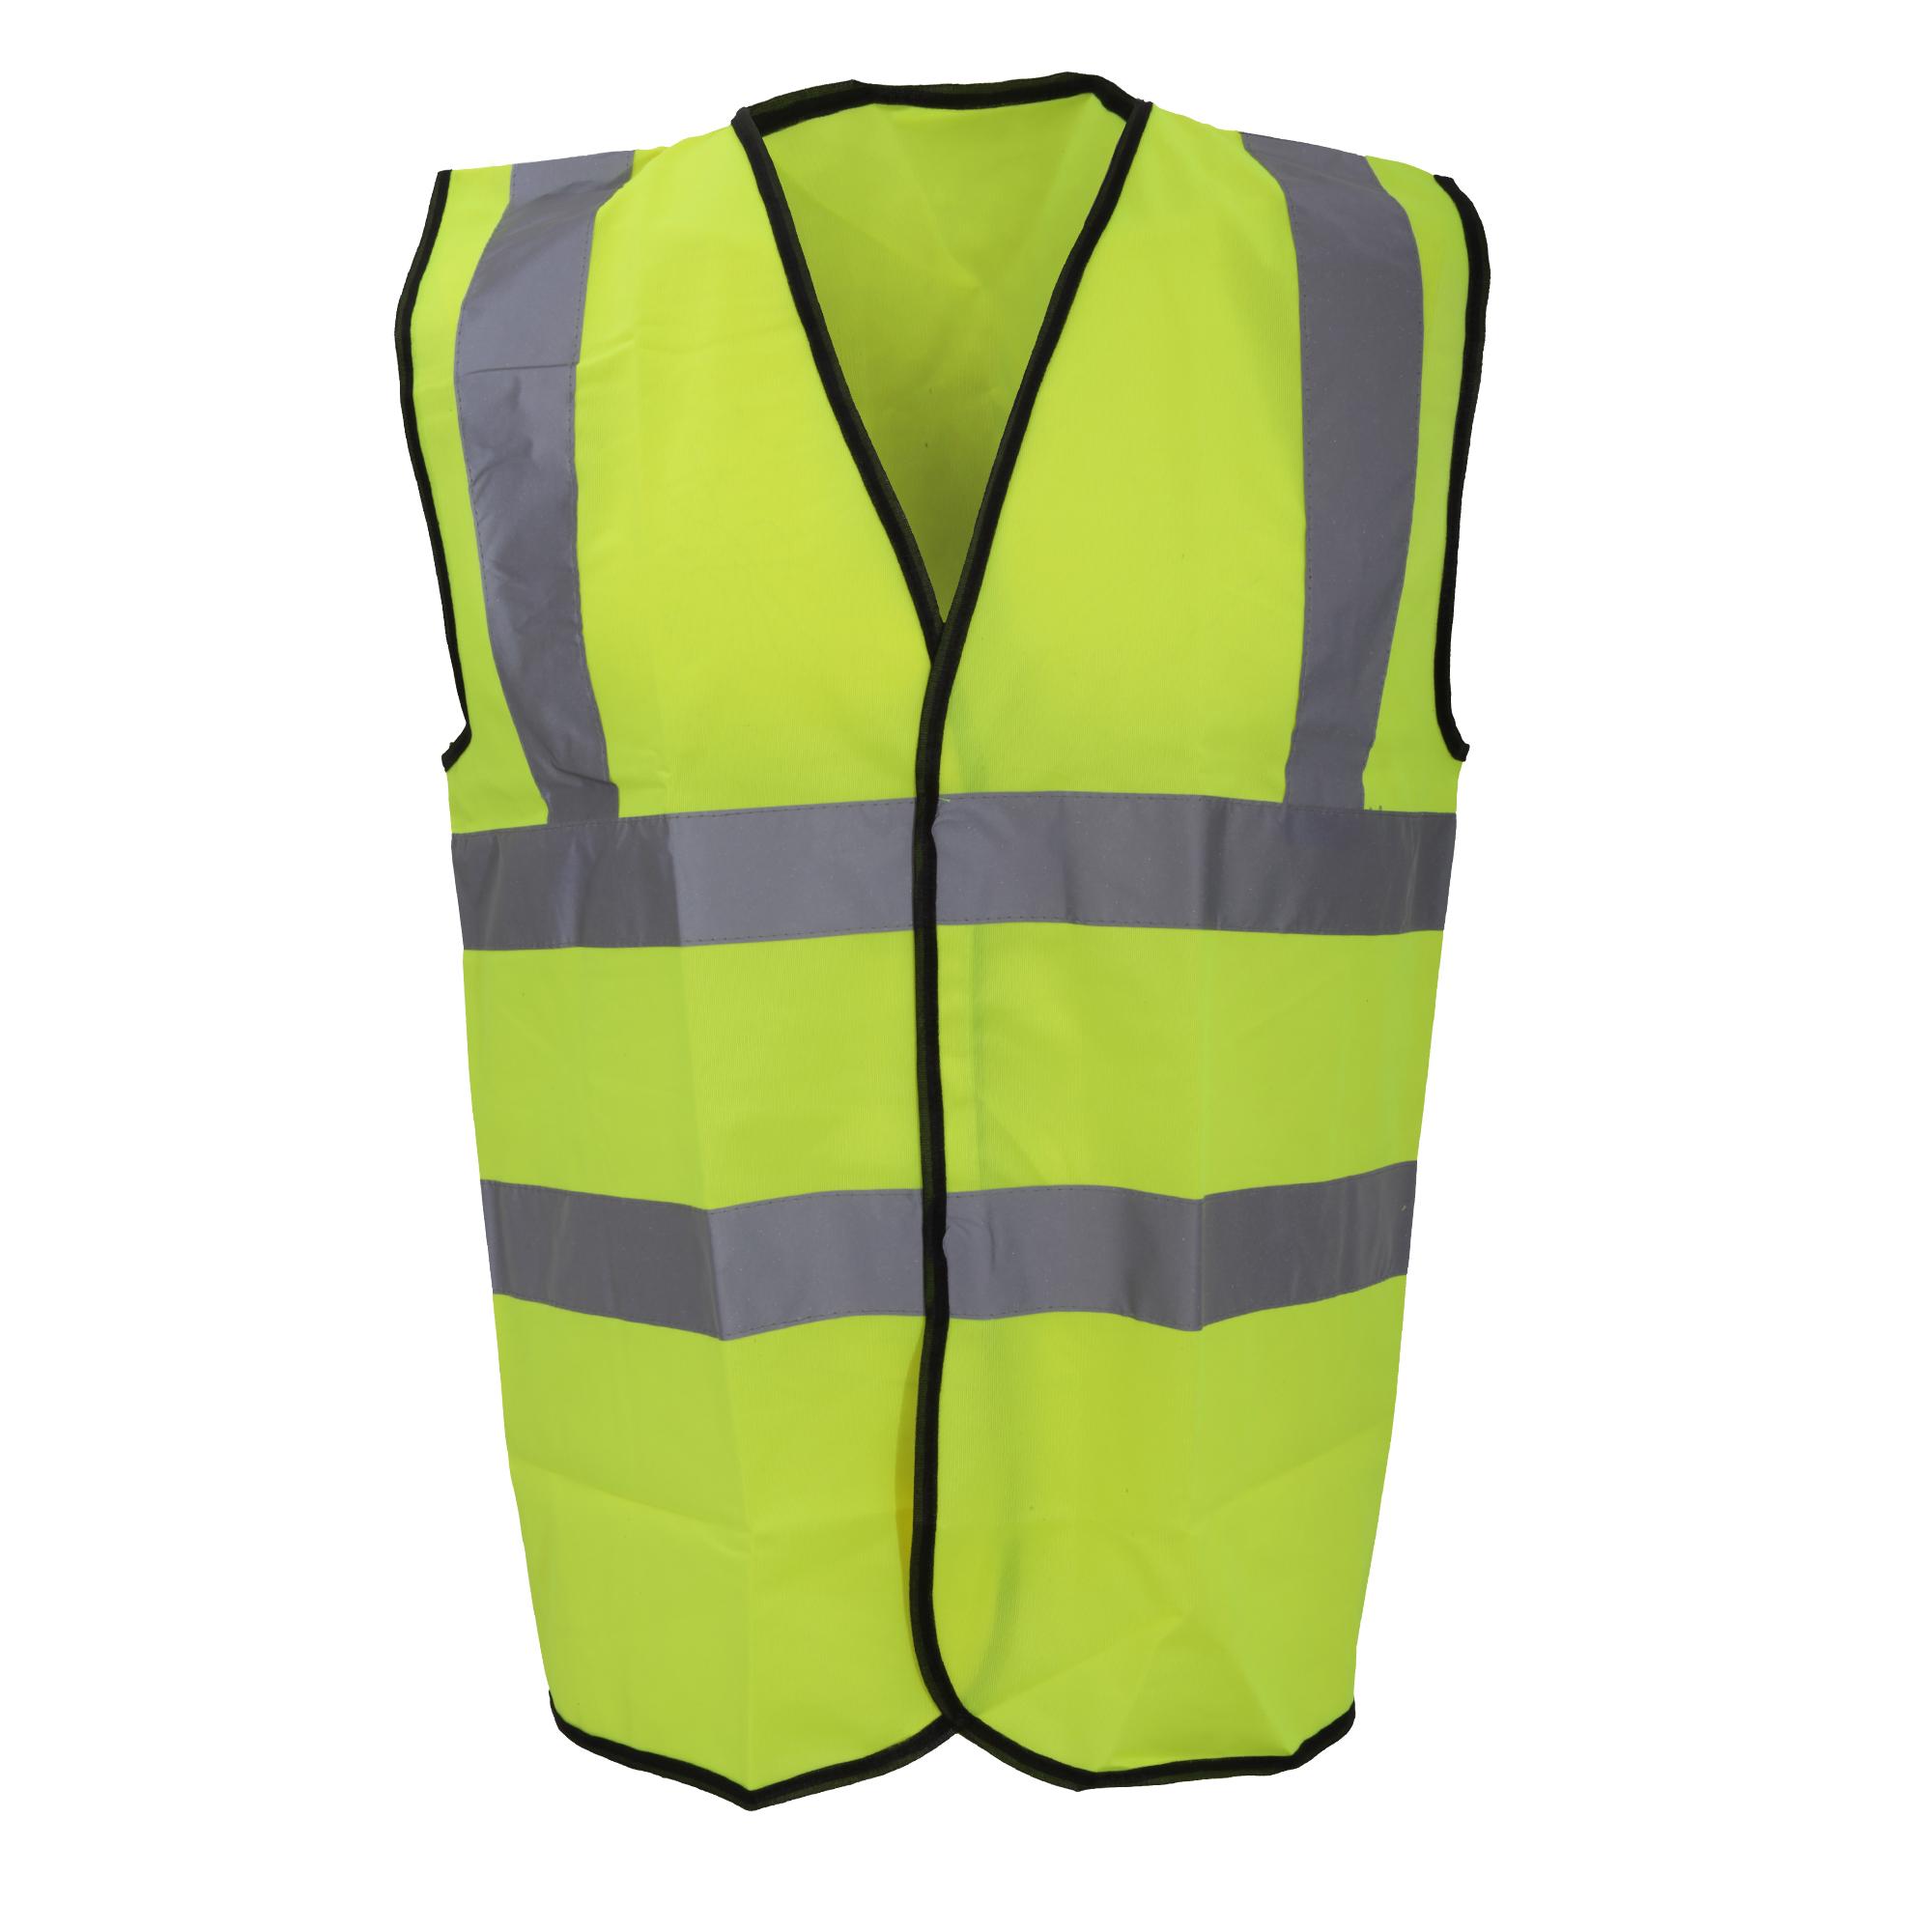 Warrior Mens High Visibility Safety Waistcoat / Vest (XXL) (Fluorescent Yellow)